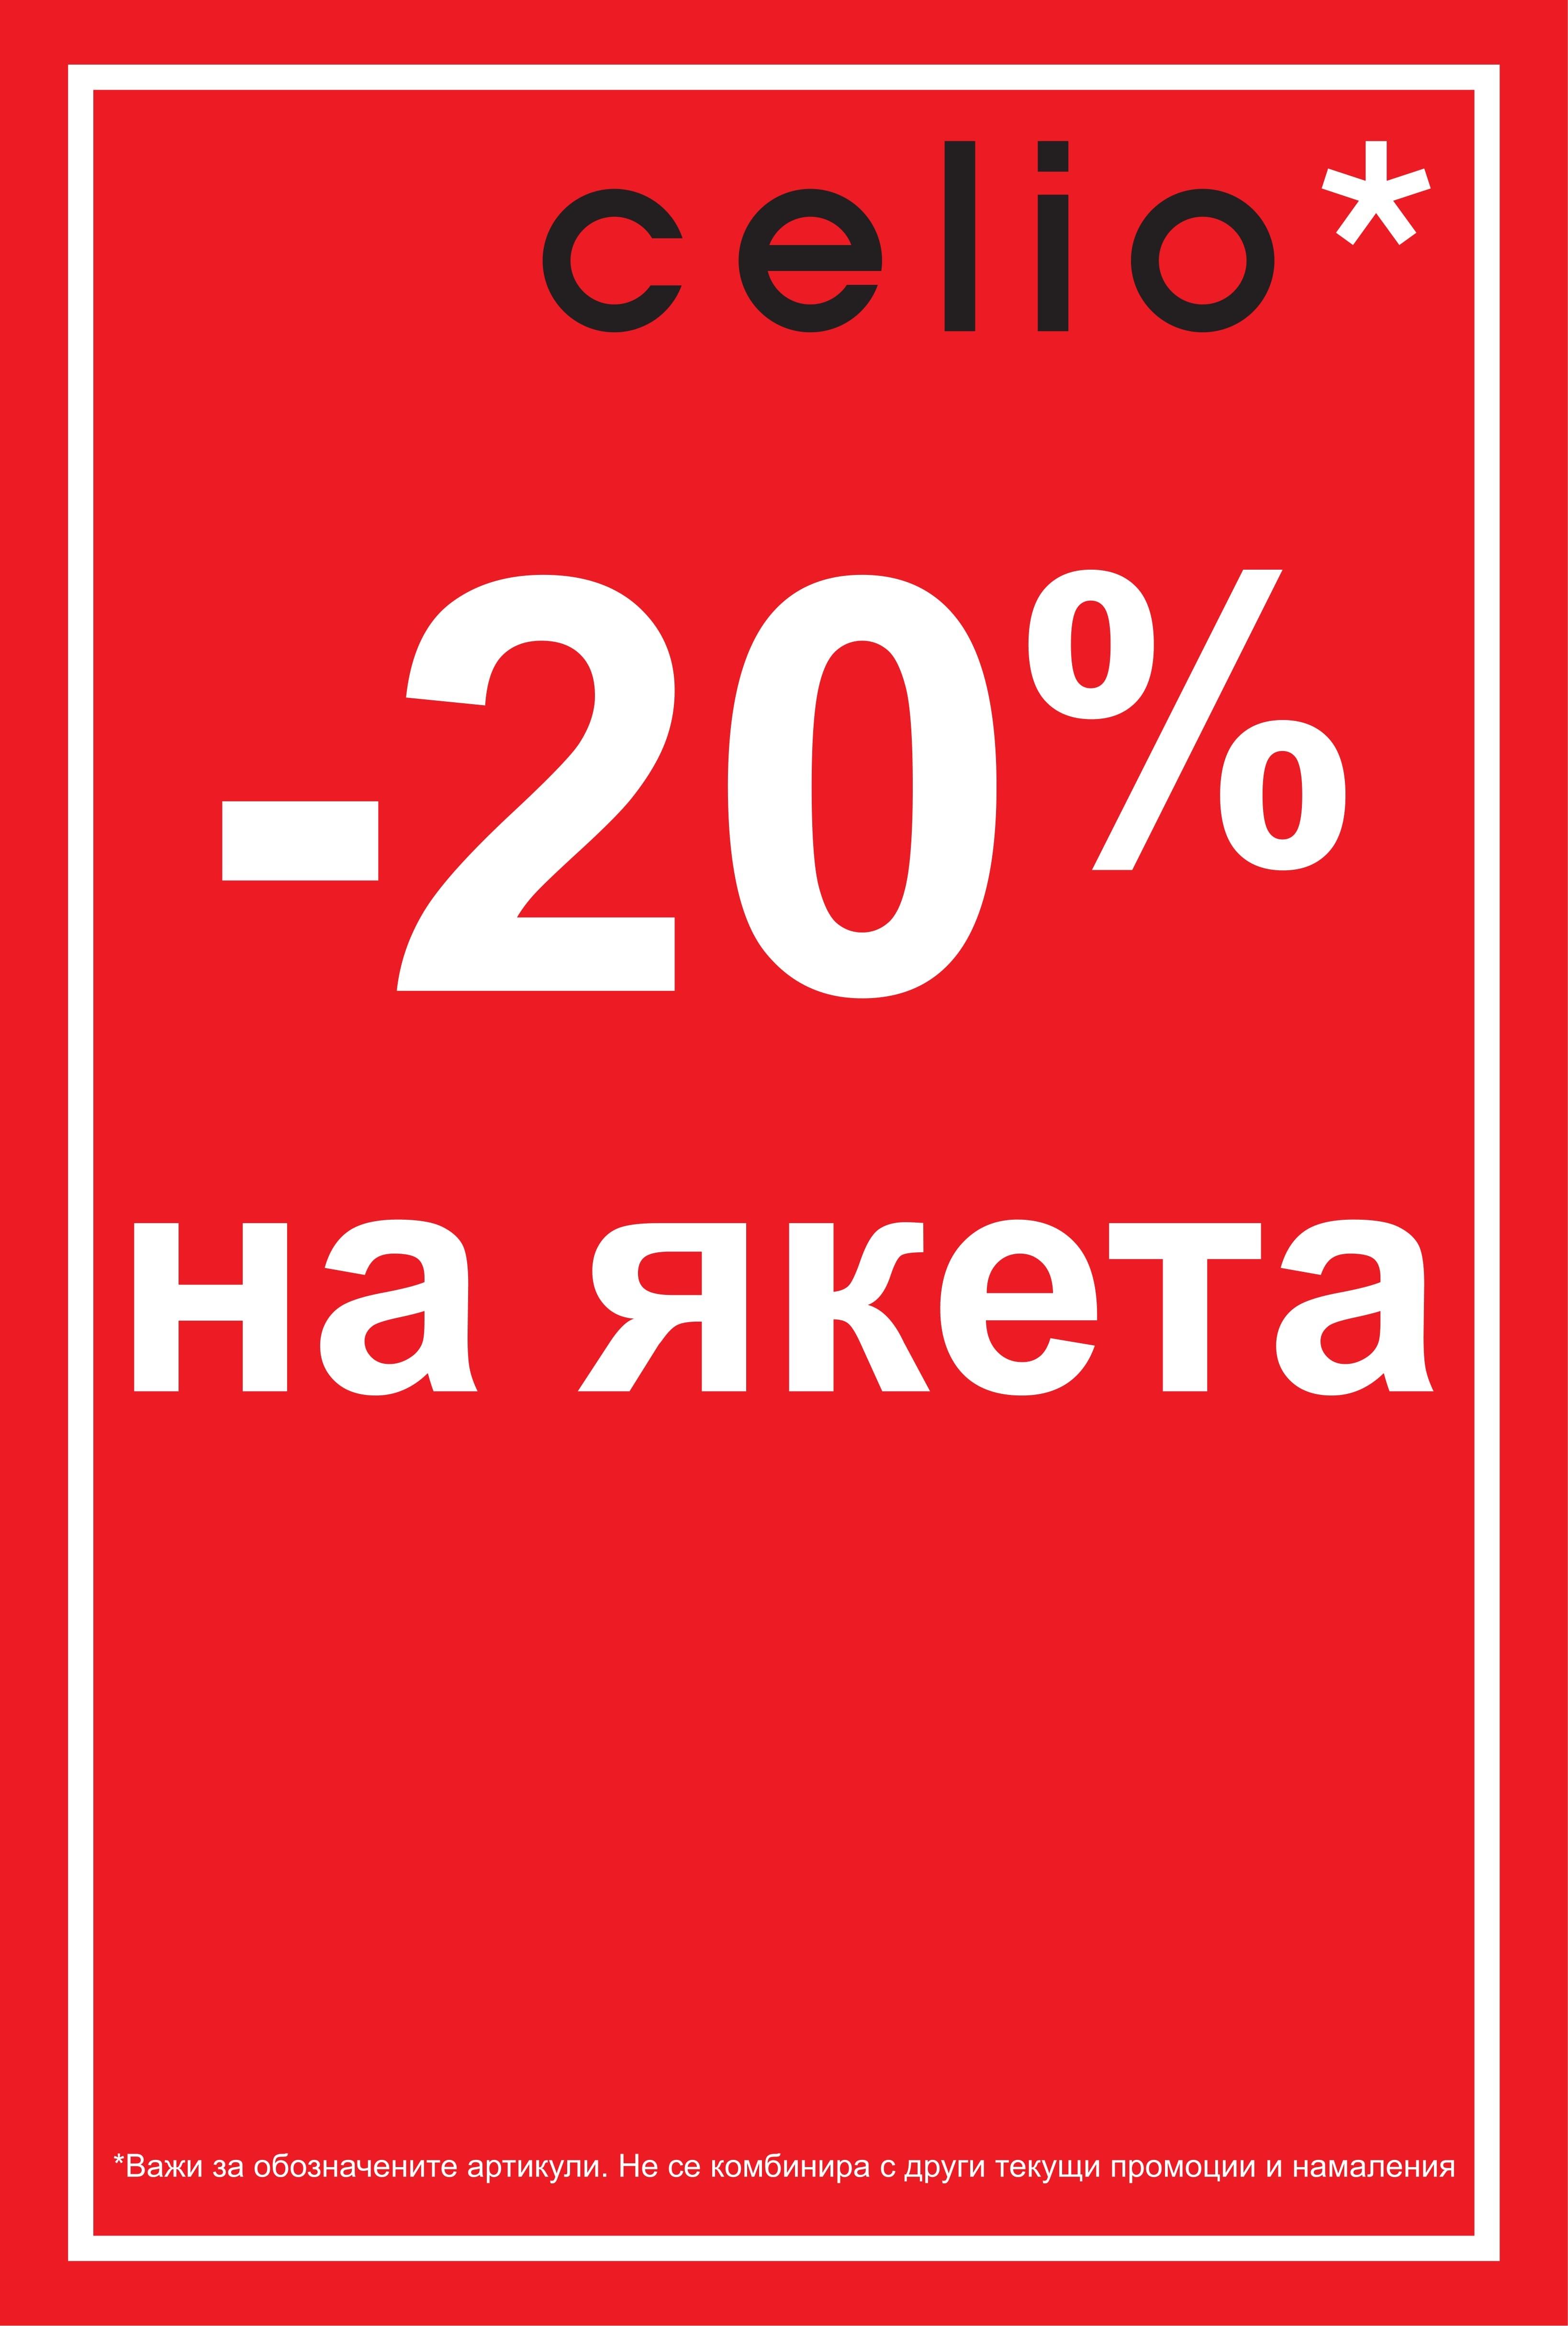 Celio* – 20% намаление на якета